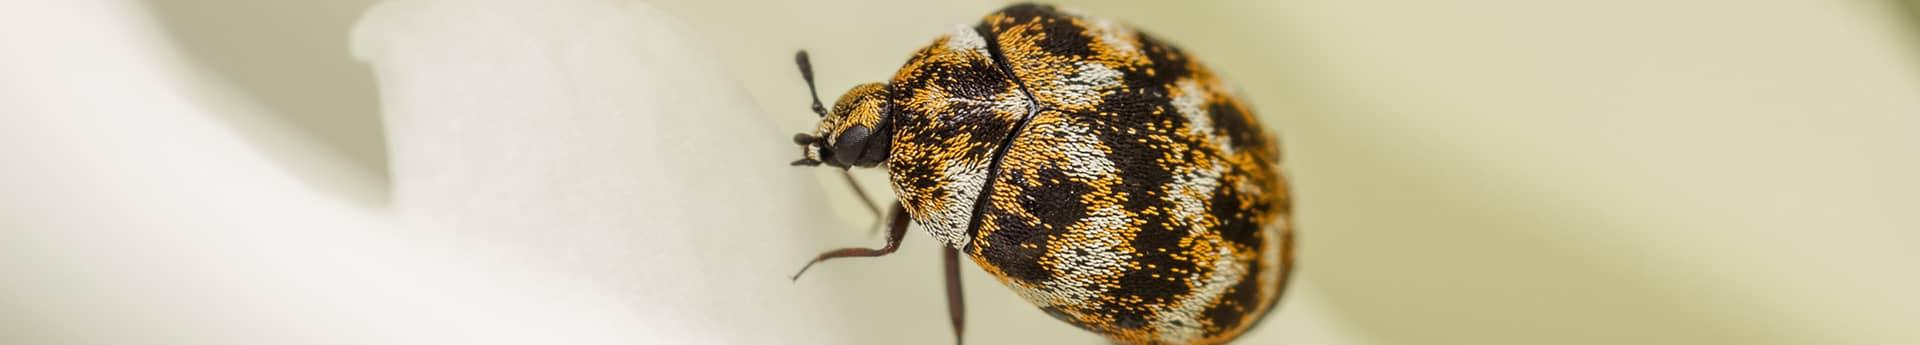 carpet beetle up close